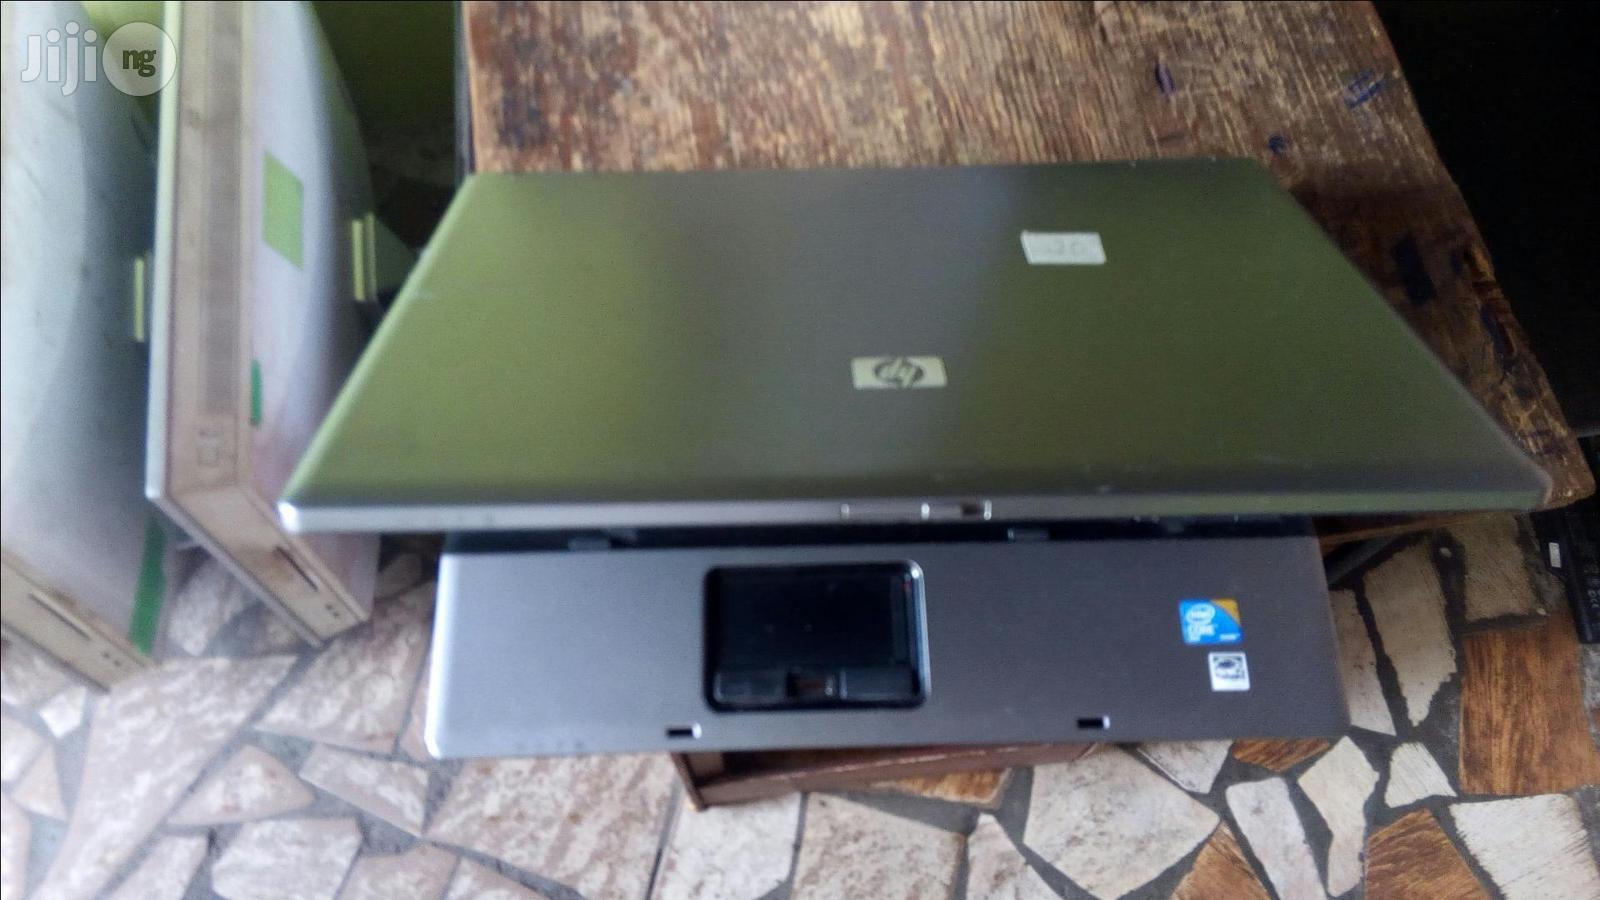 Laptop HP Compaq 6730b 2GB Intel Core 2 Quad HDD 160GB   Laptops & Computers for sale in Mushin, Lagos State, Nigeria